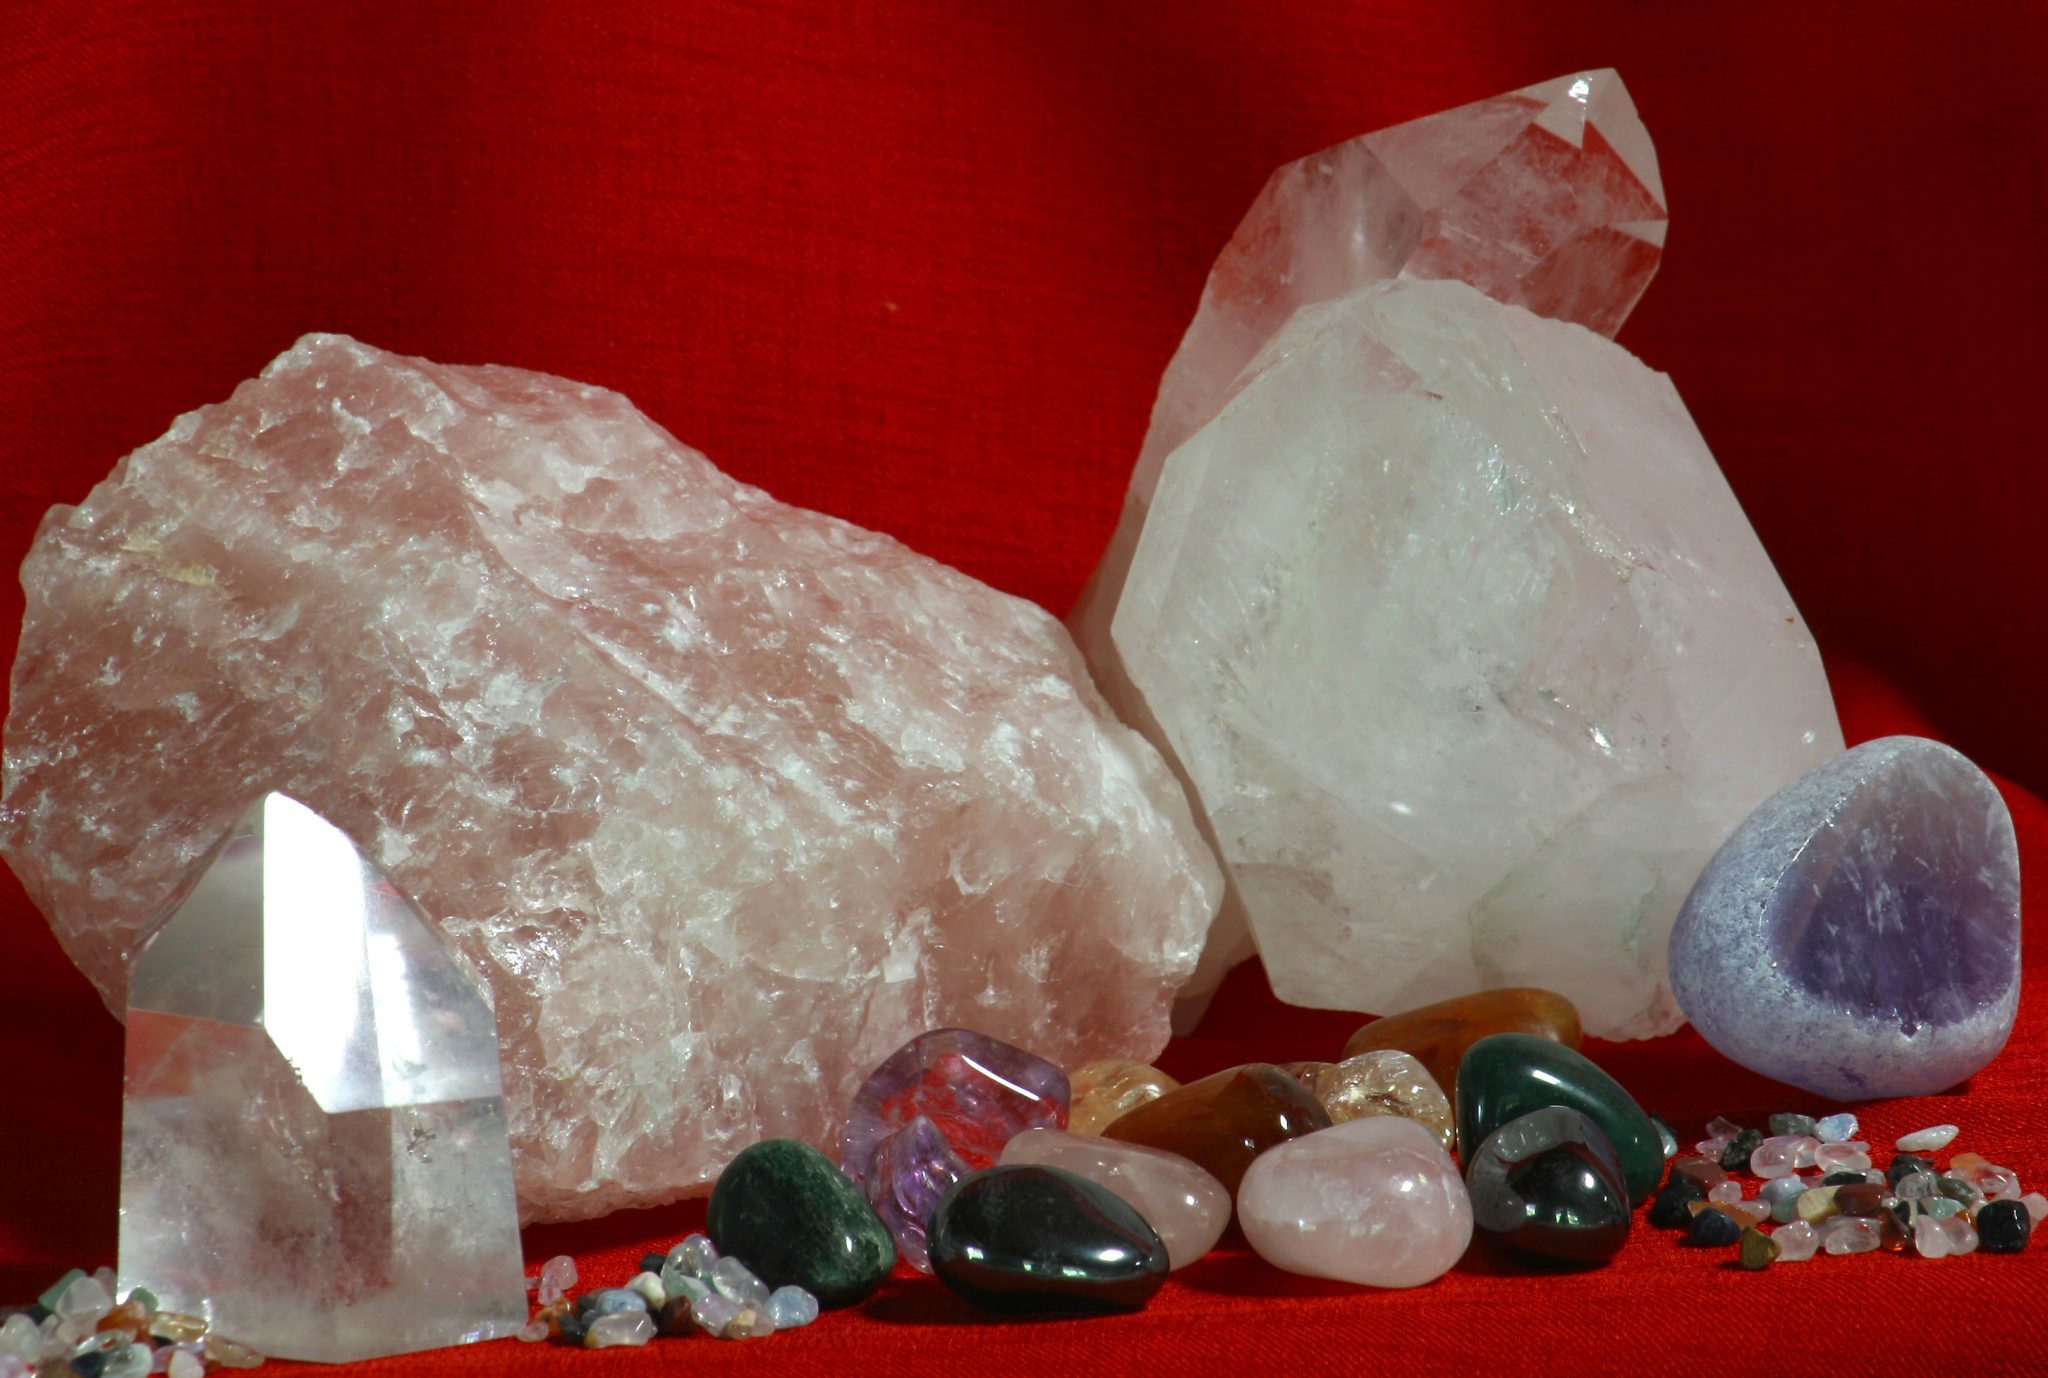 Buy Crystals OnLine - Healing crystals - My CrystalAura